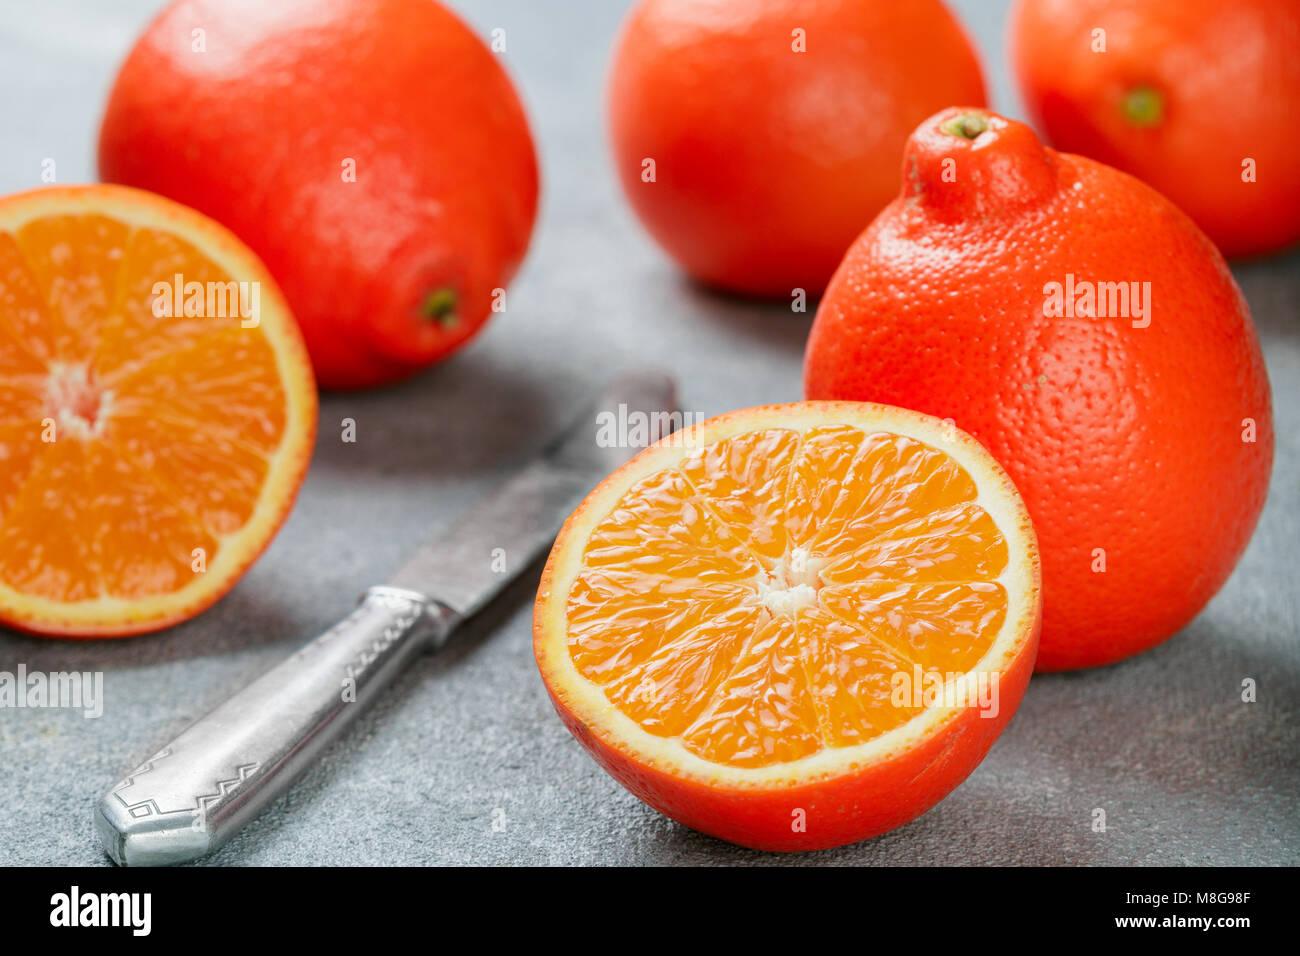 Mineola. Tangerine. Juicy sweet orange citrus fruit whole and sliced on a concrete background. Selective focus - Stock Image